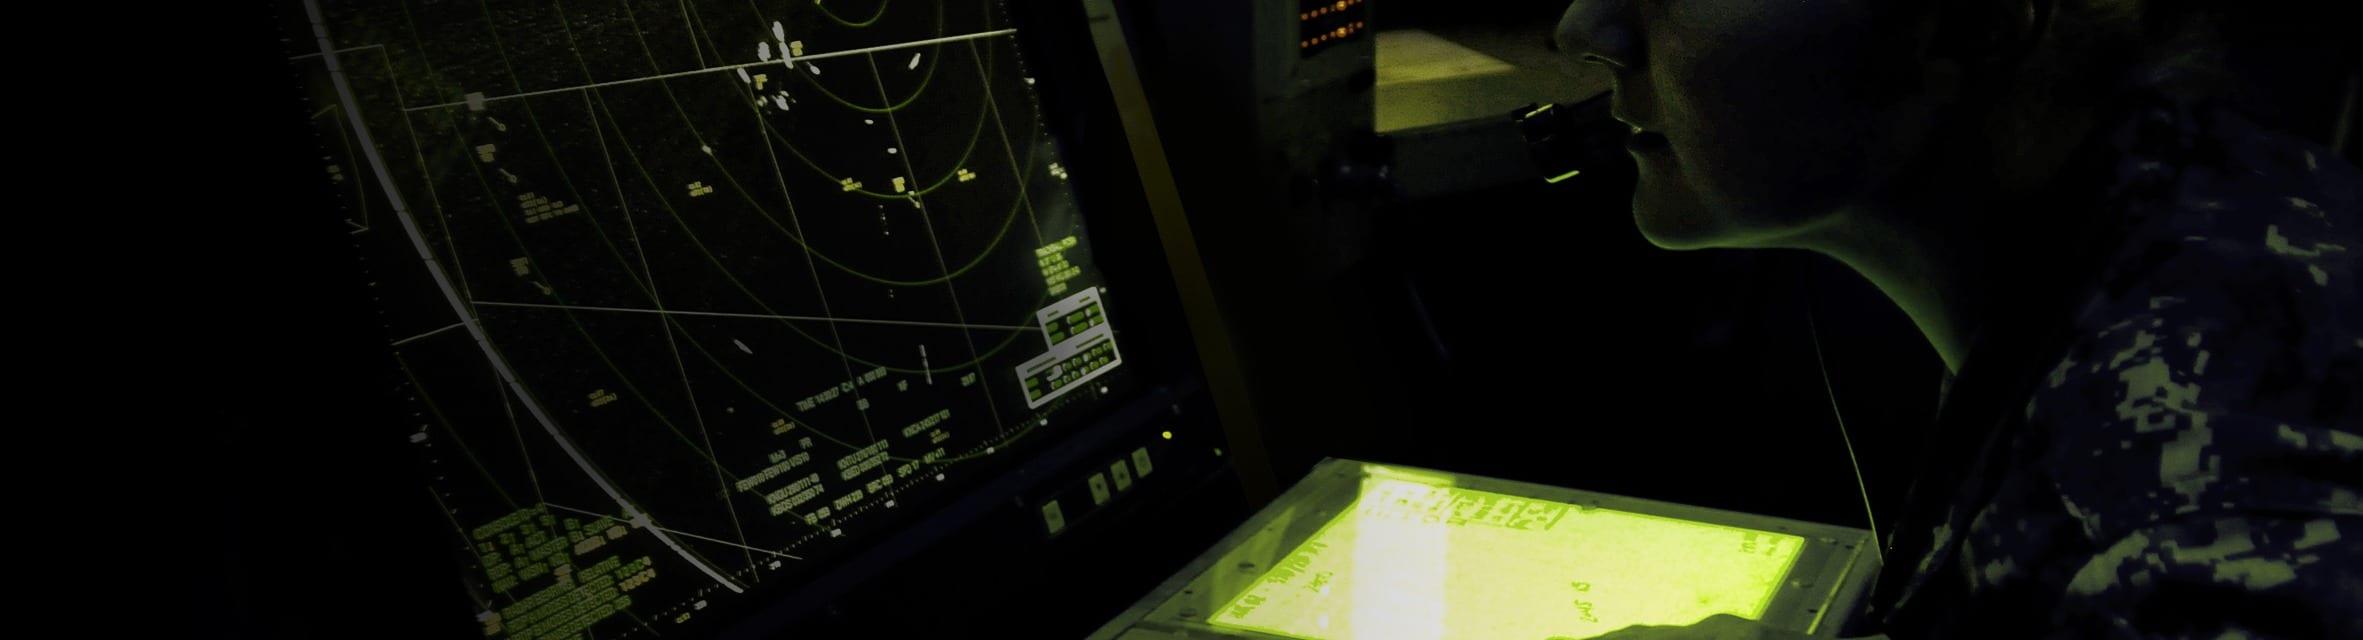 Military EMC Testing